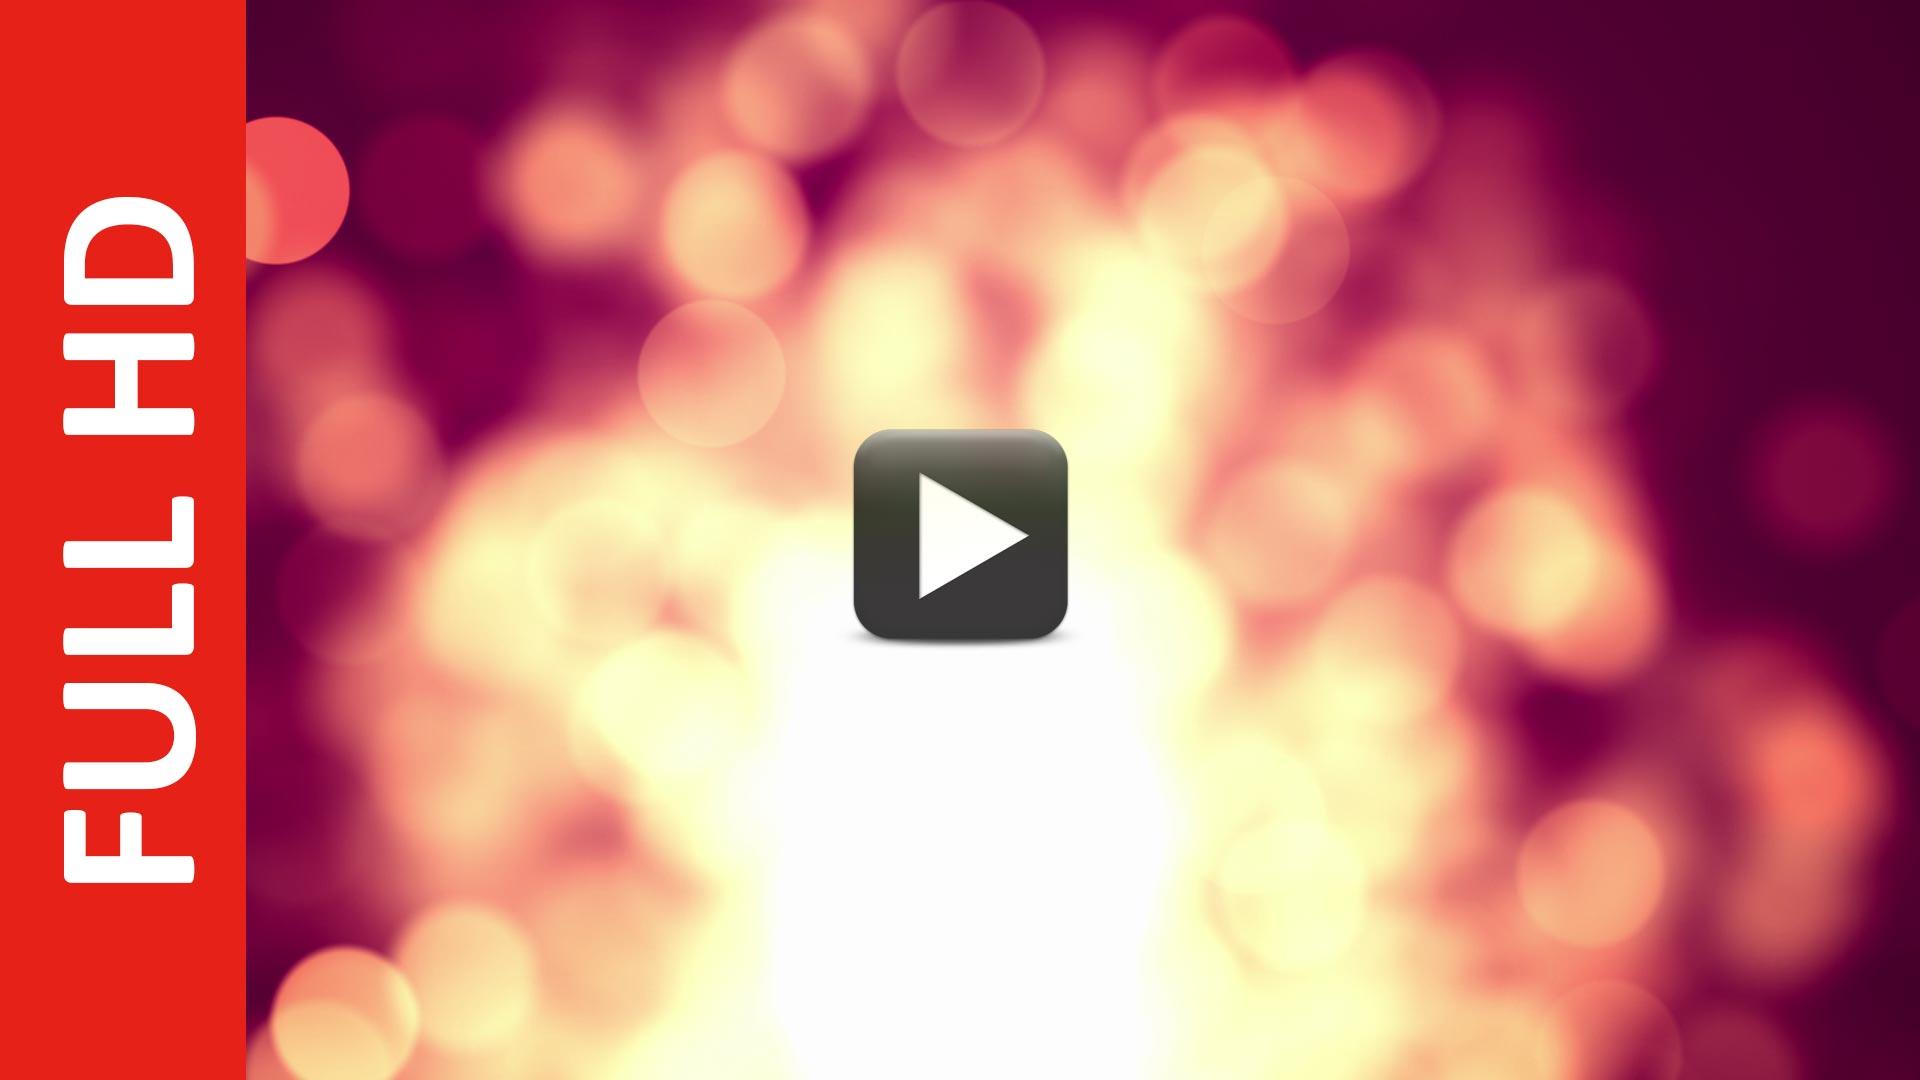 Slow Motion Background Loop | New Bokeh Video Full HD